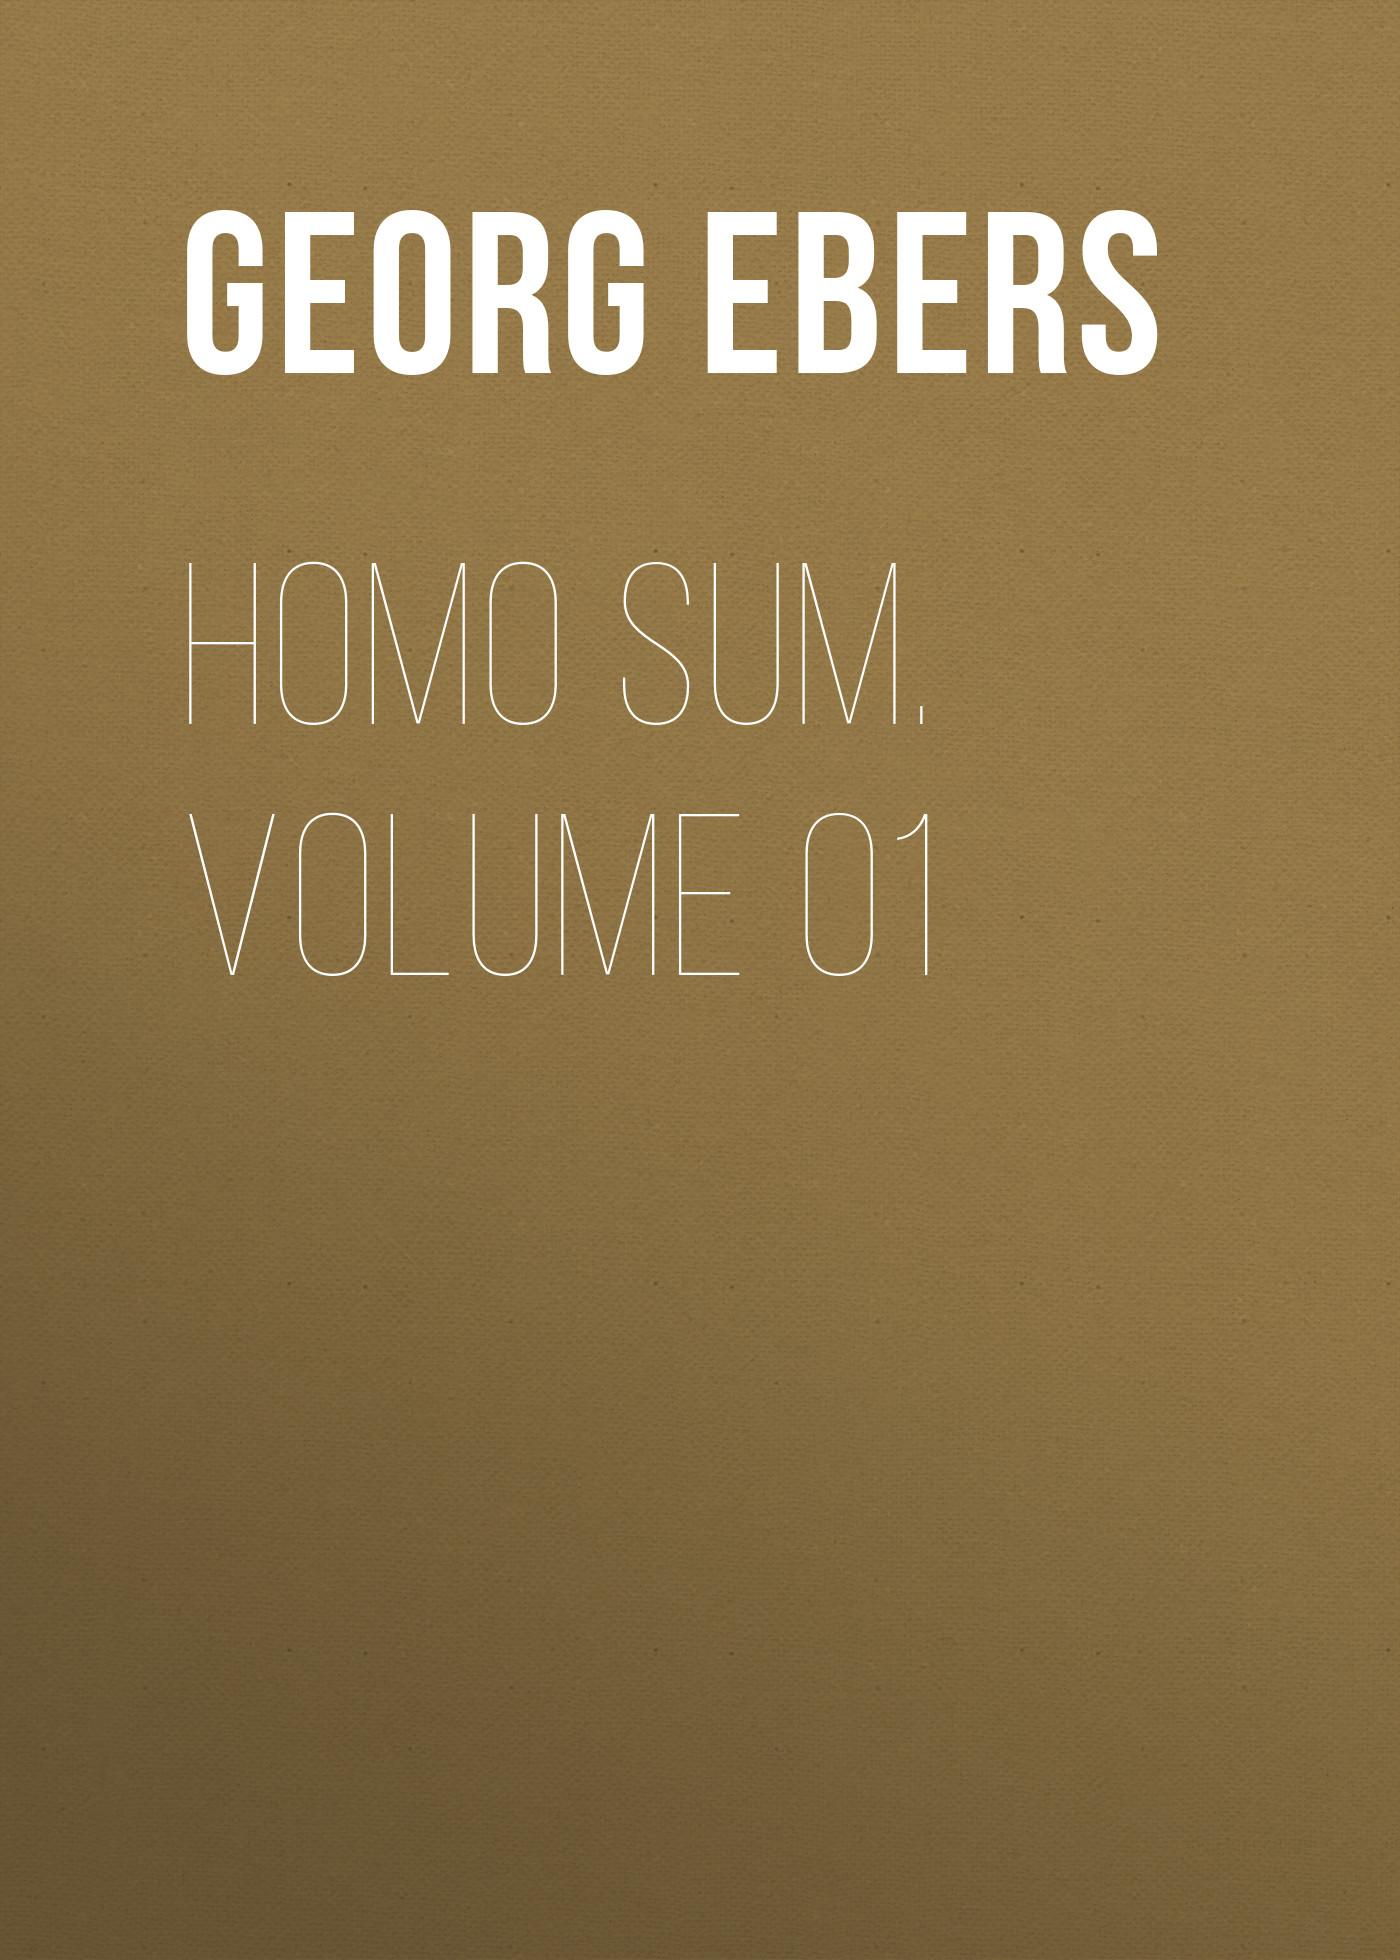 Georg Ebers Homo Sum. Volume 01 georg ebers homo sum volume 02